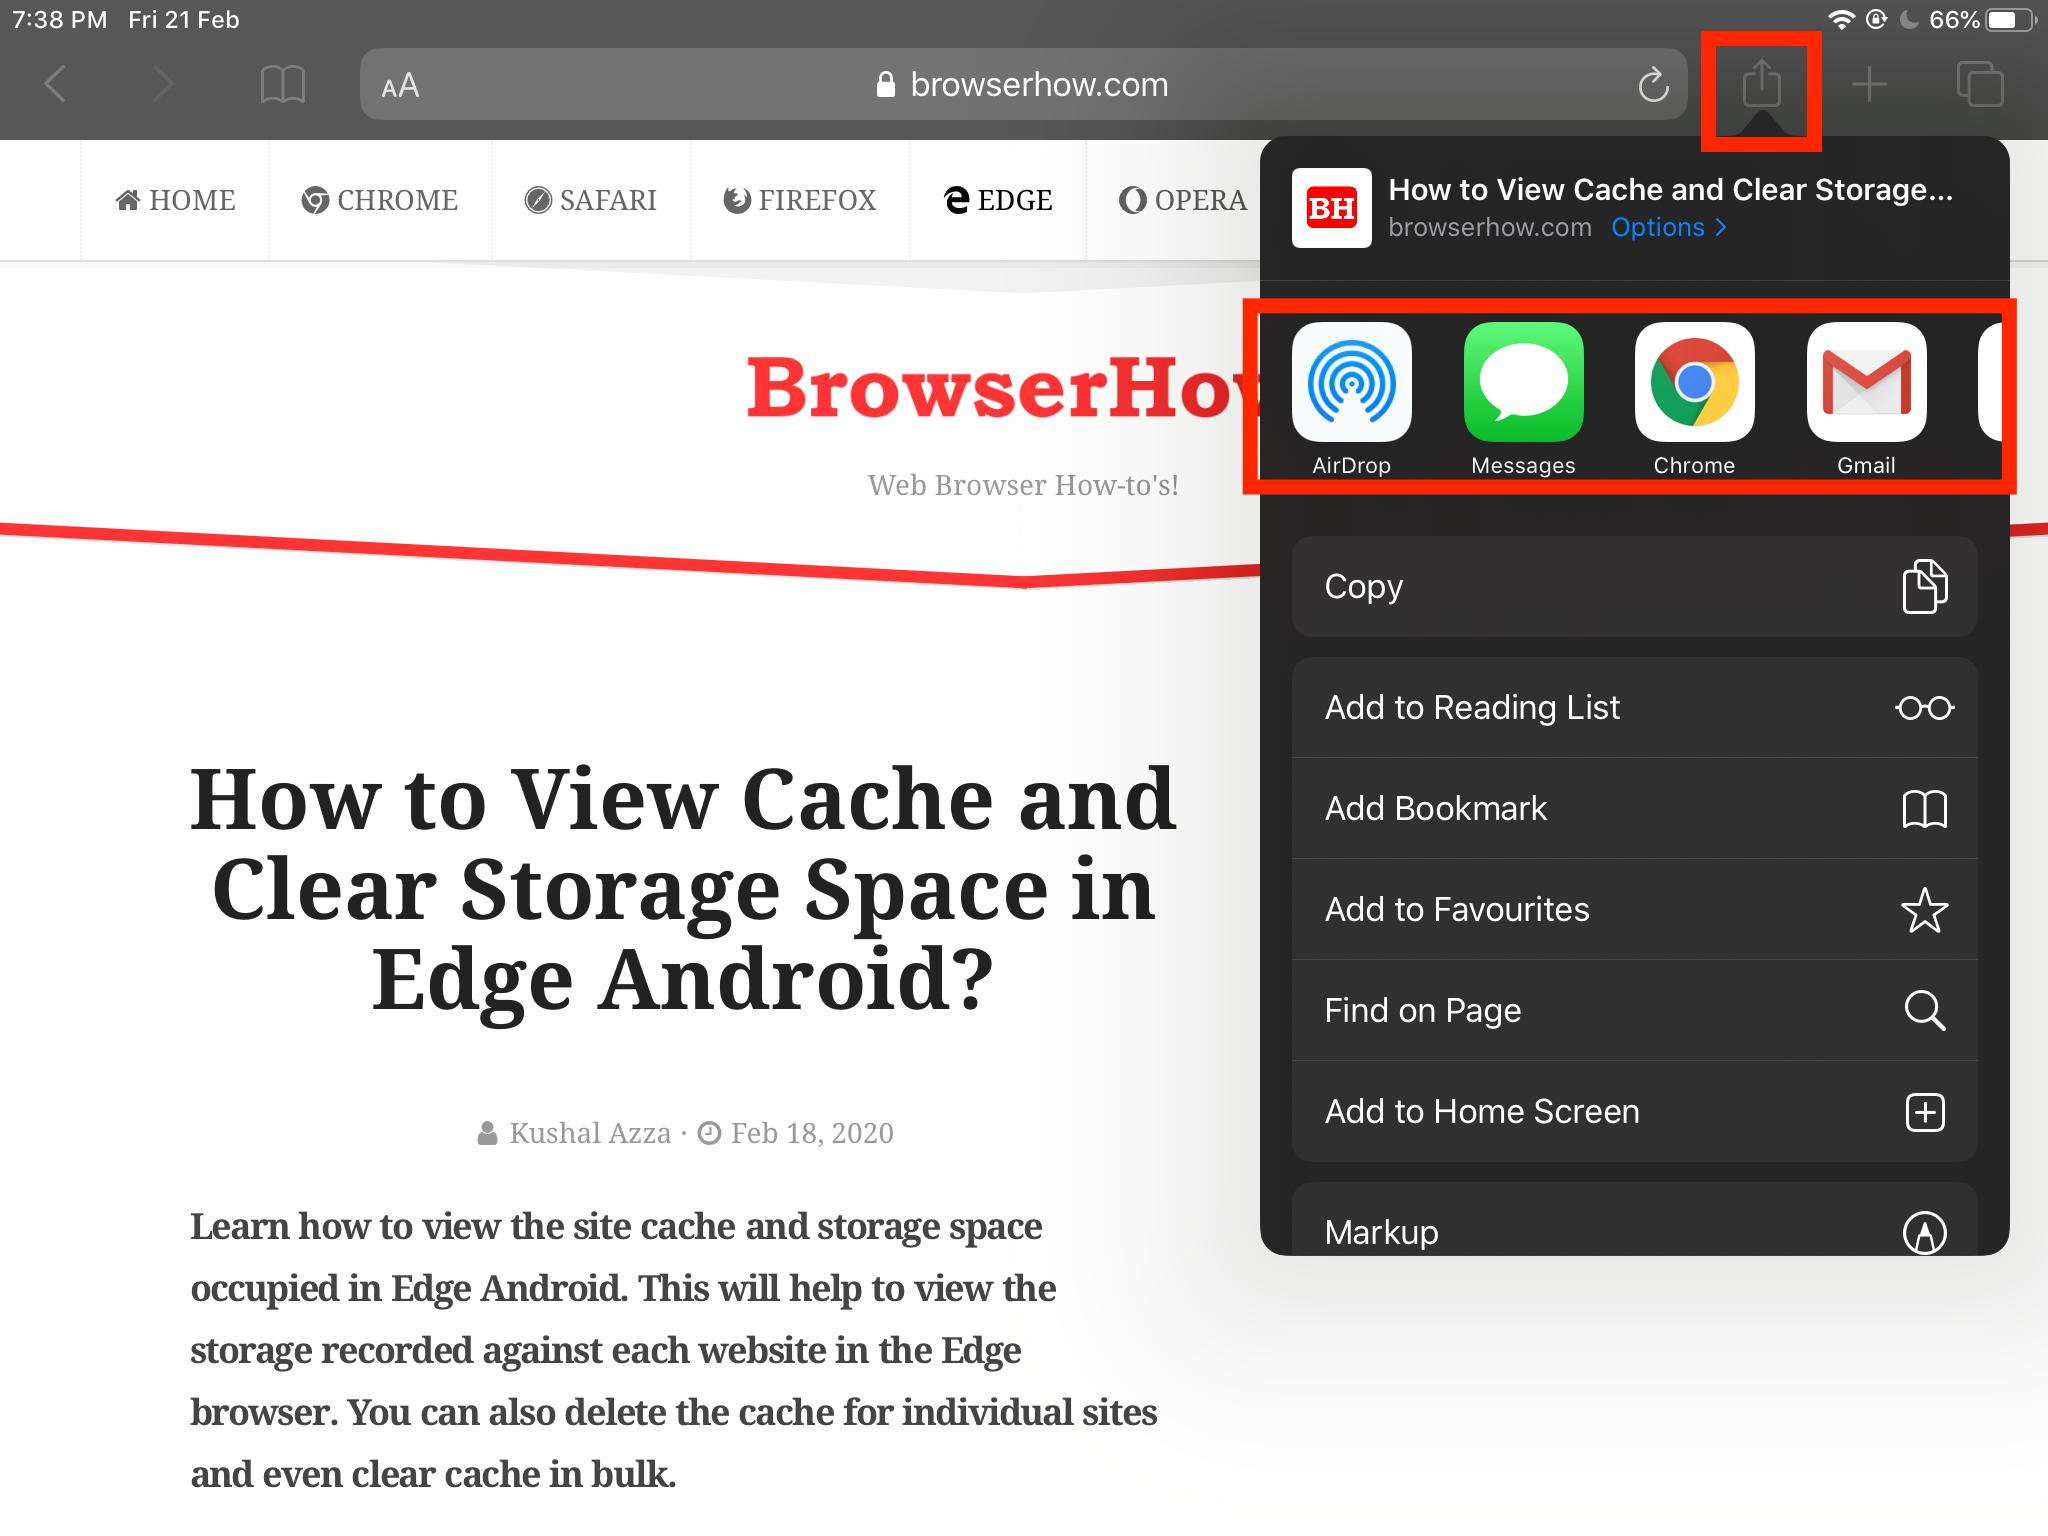 Share Website Link via External App on iPhone or iPad